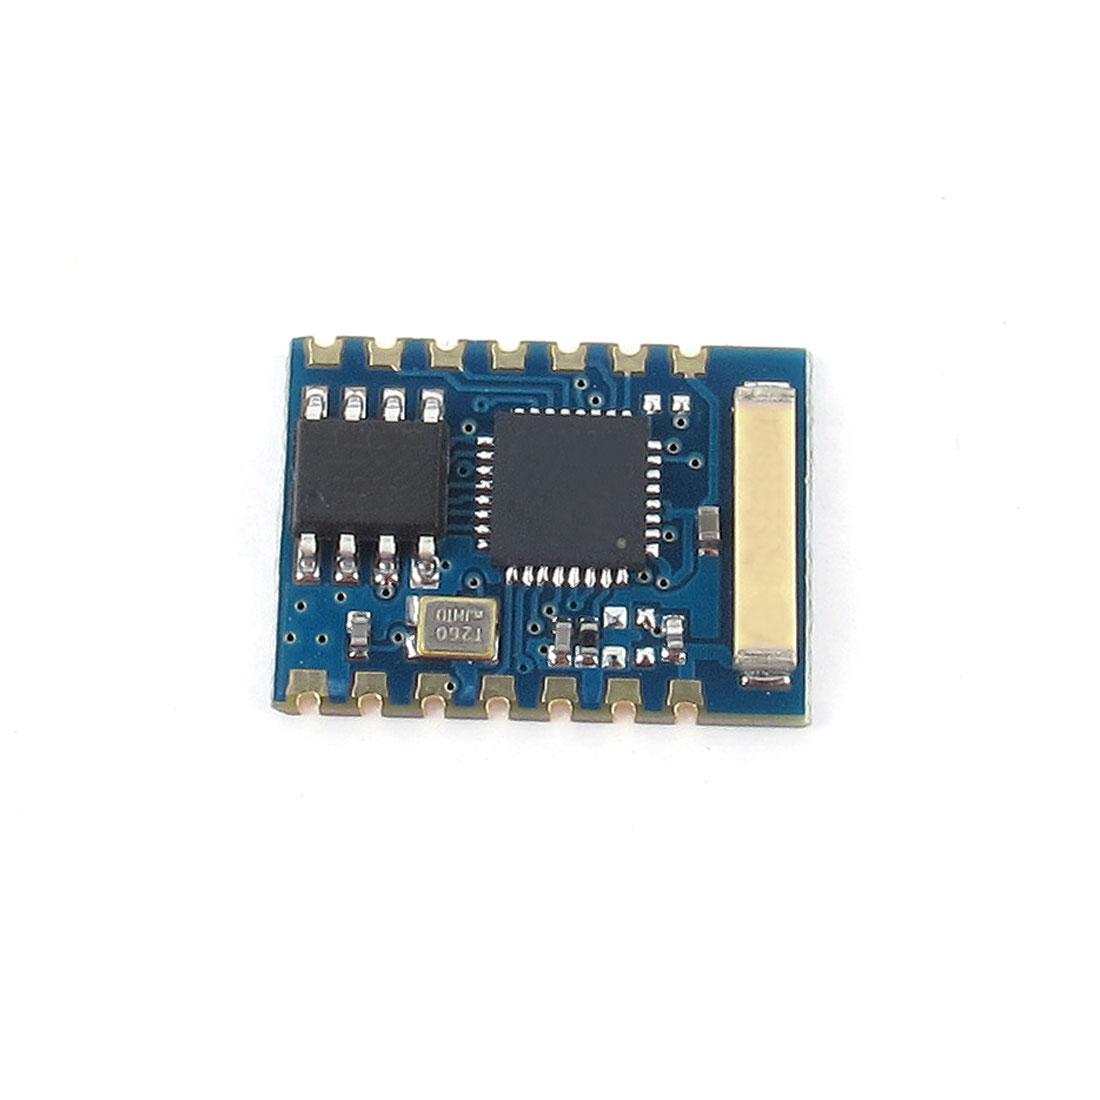 ESP8266 Serial Wireless WIFI Transceiver Module Send Receive LWIP AP+STA A - image 2 of 2